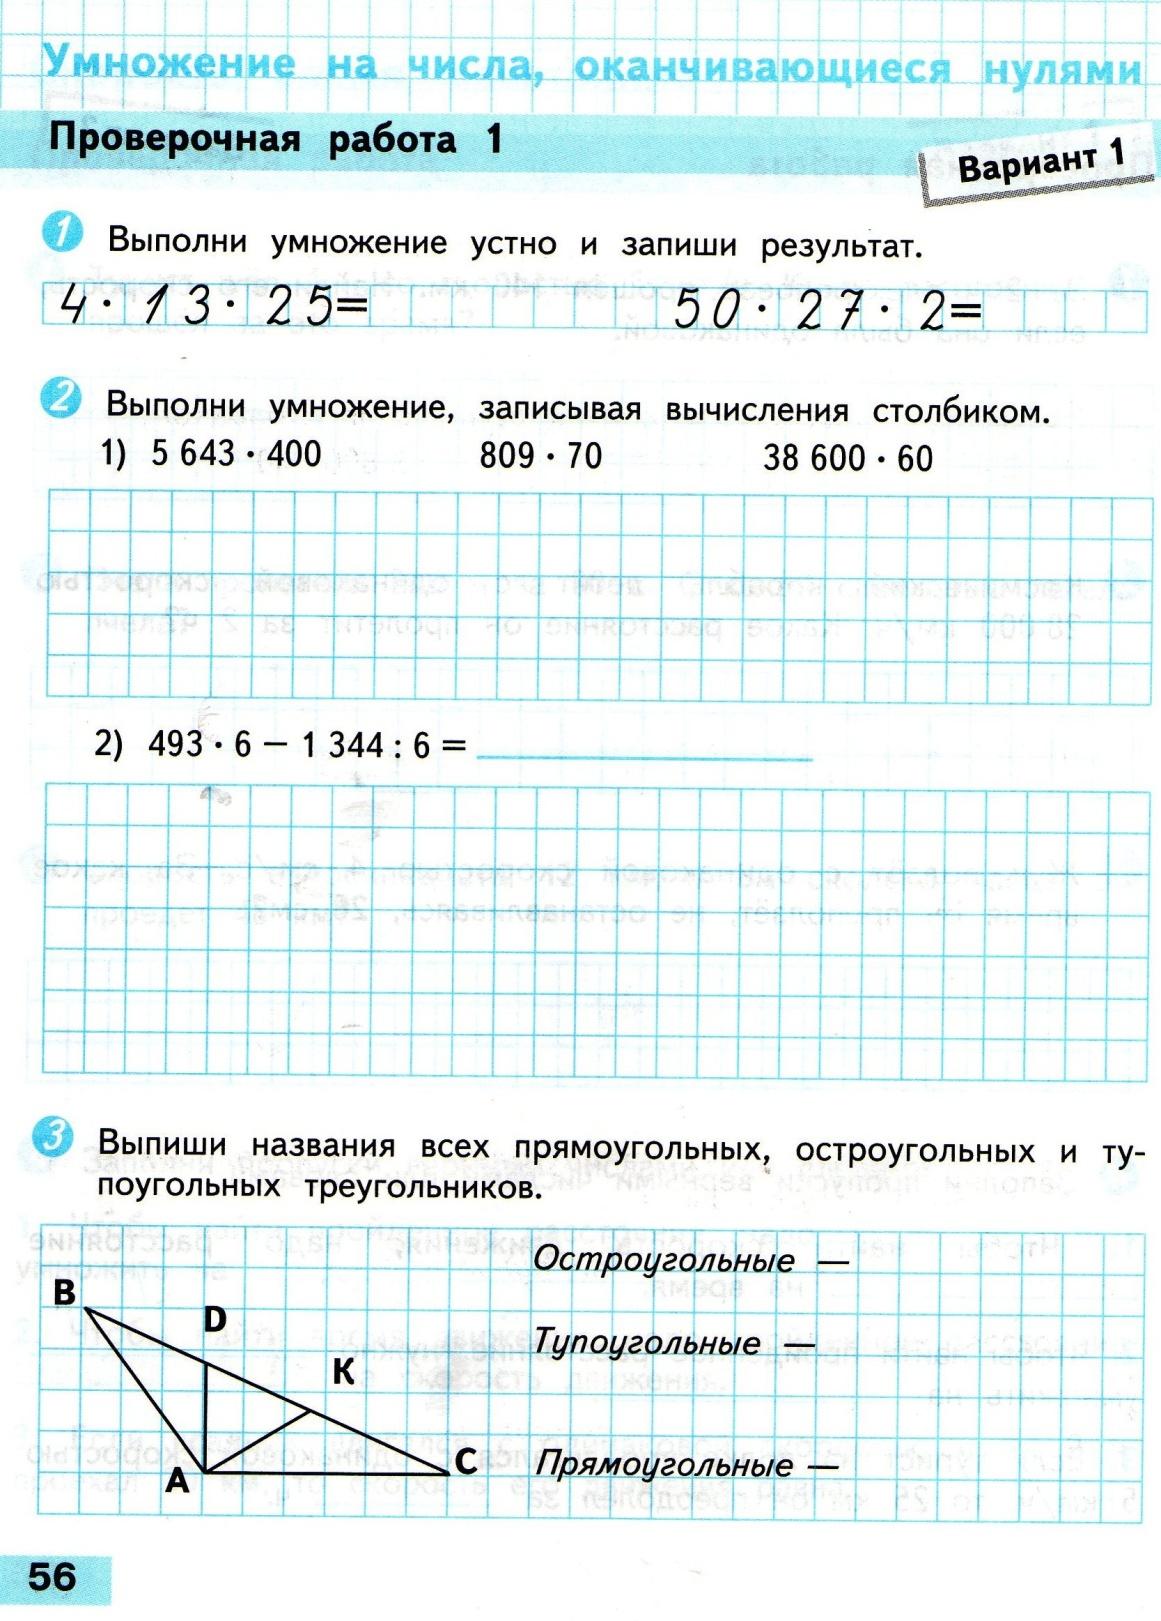 Гдз за 4 класс по математике проверочная работа